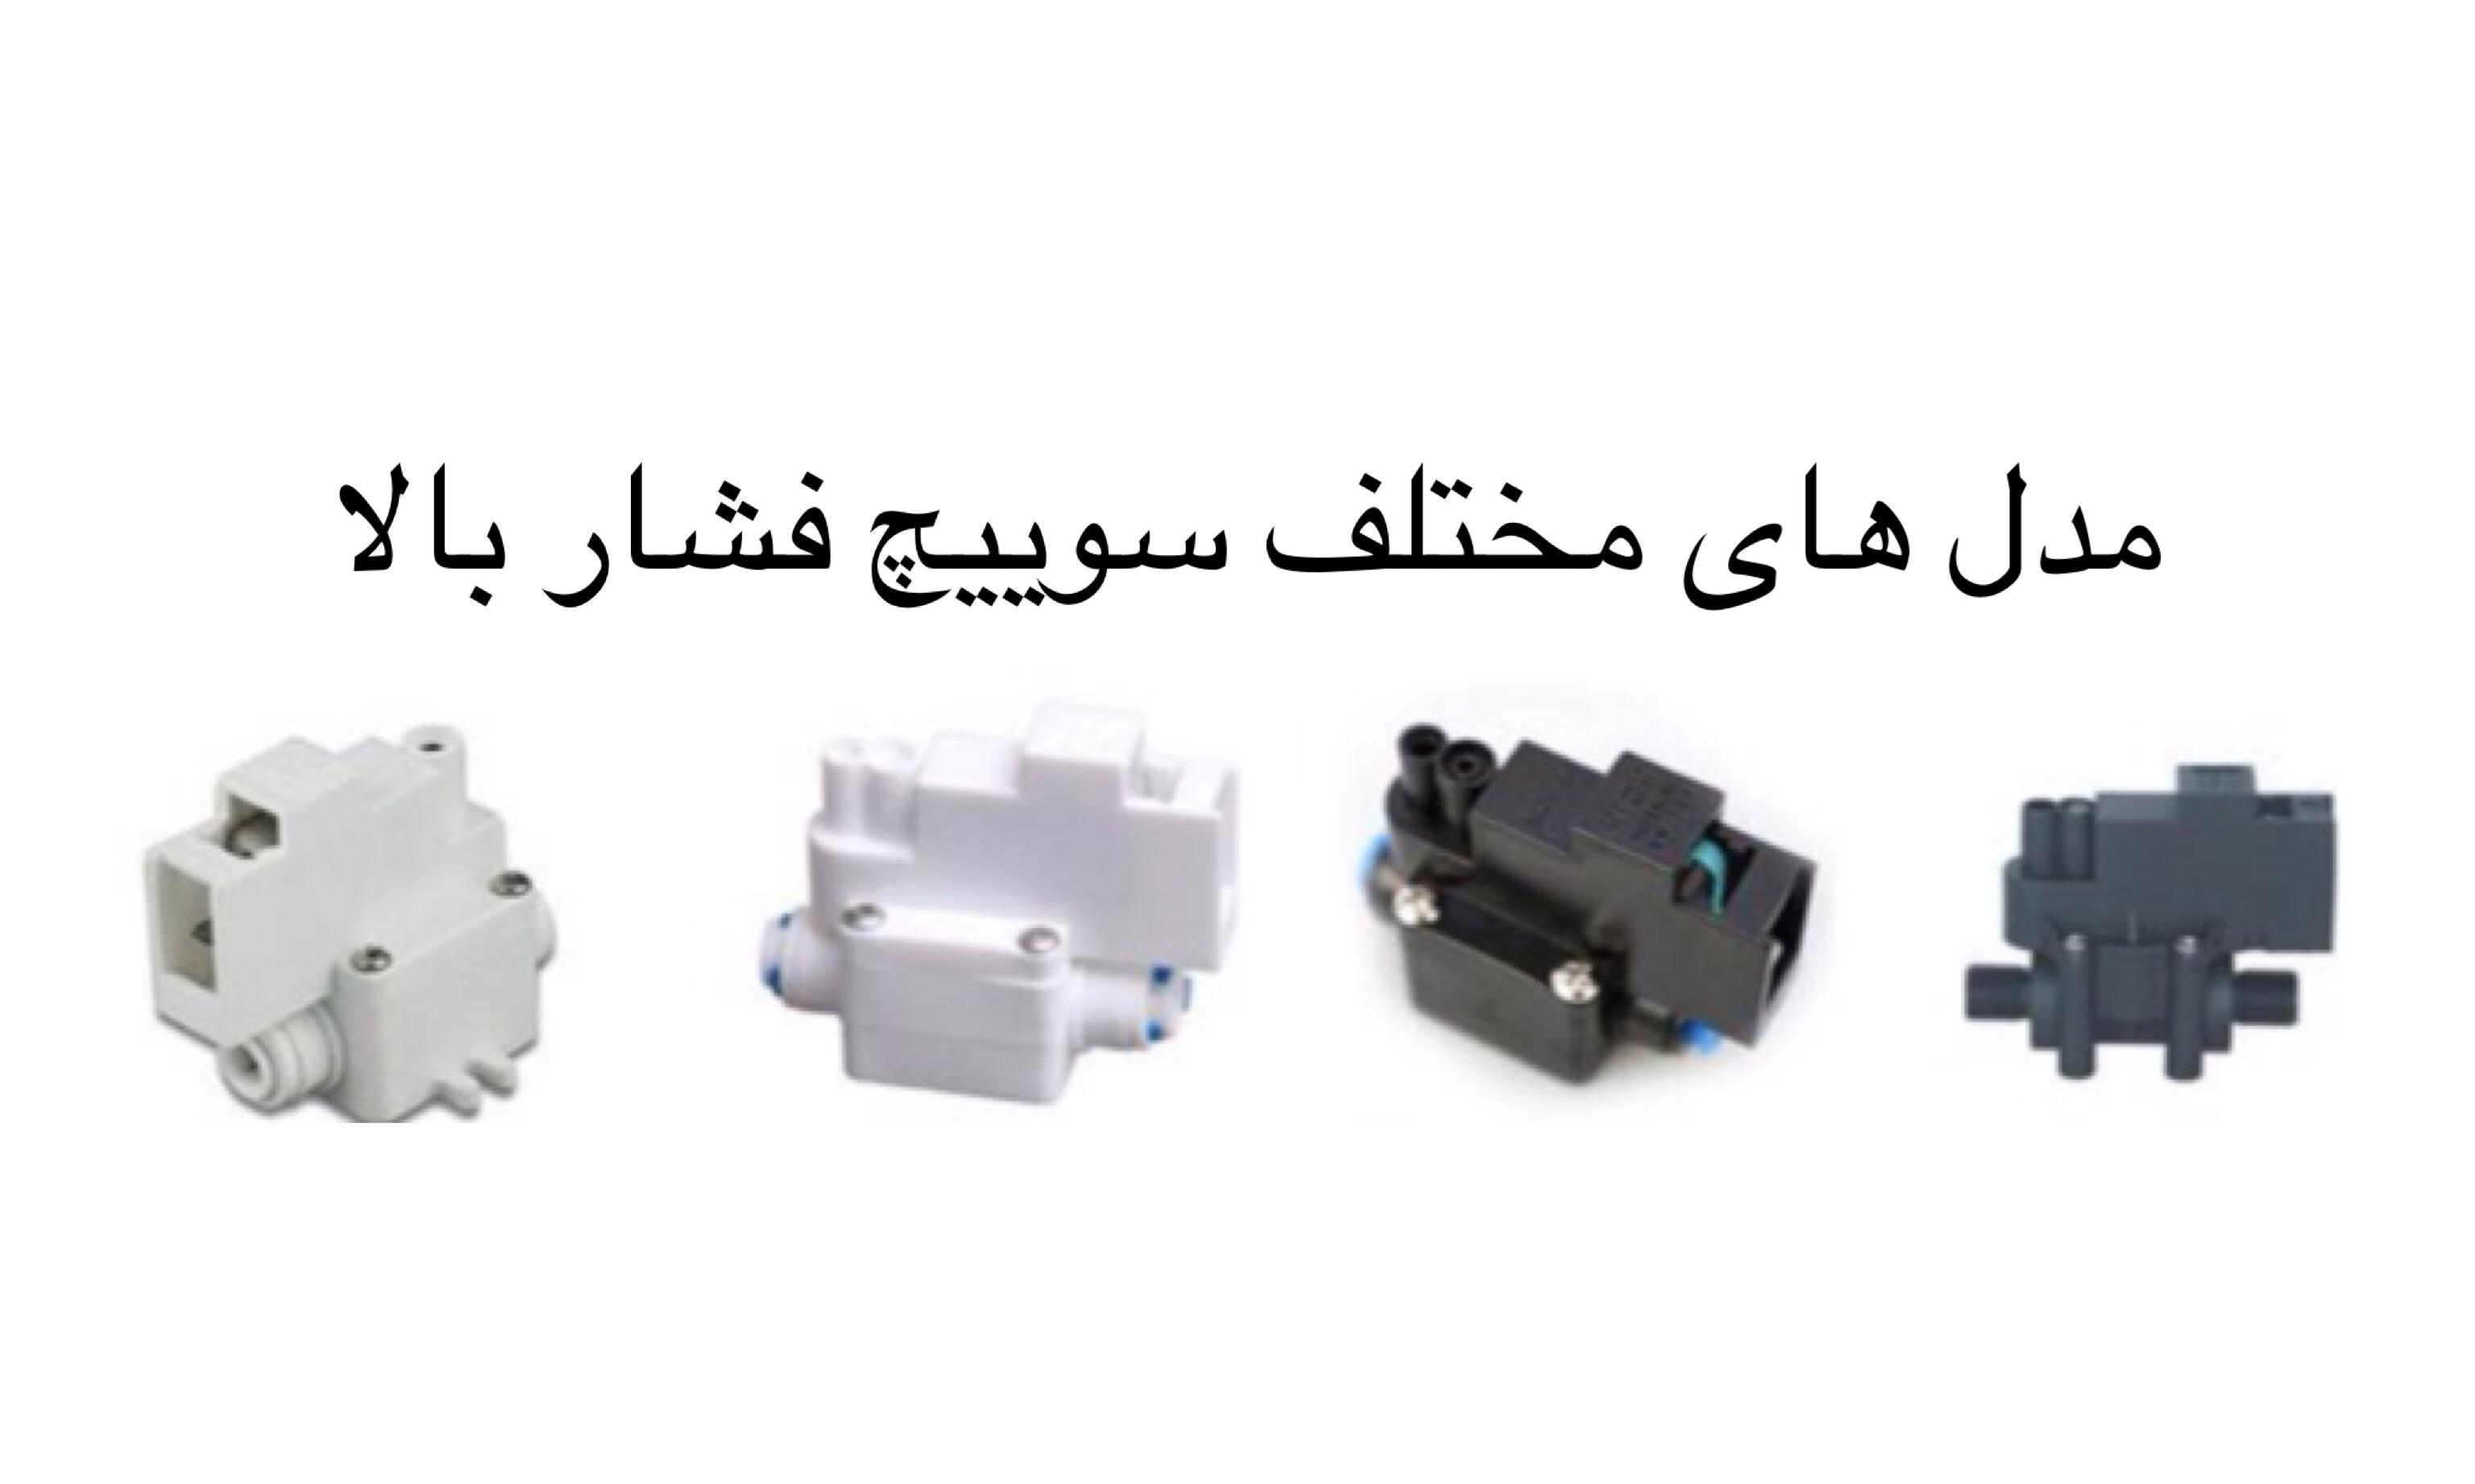 سنسورهای پرشر و لوپرشر تصفیه آب